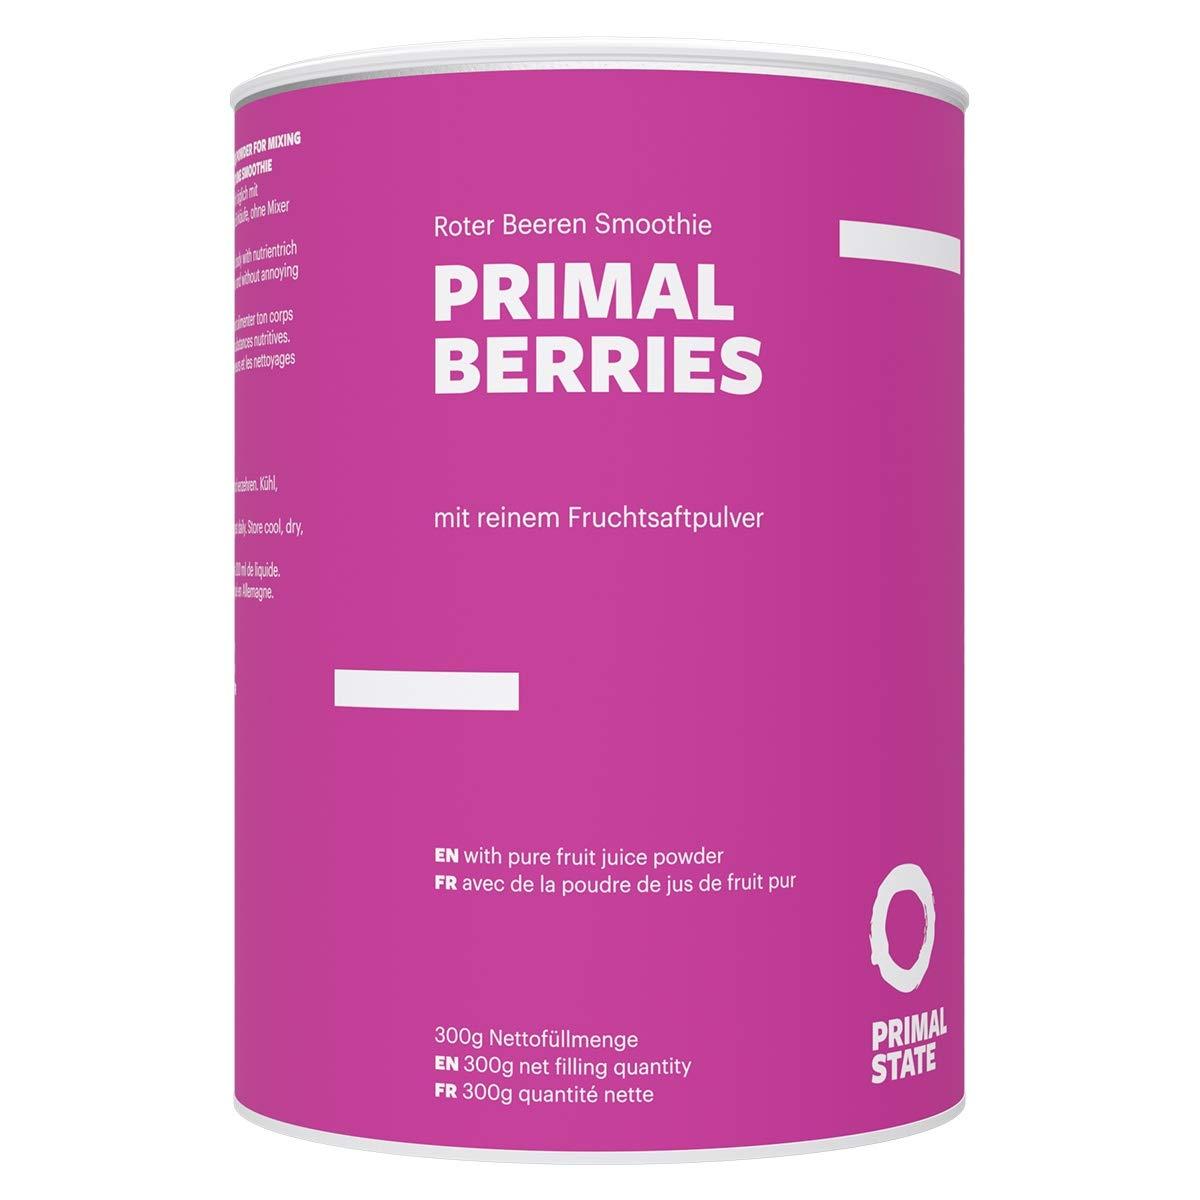 Beeren Smoothie Pulver | Primal Berries | Aktivierend – Antioxidantien und Energie aus Beeren & tonischen Wurzeln | Vegan mit Heidelbeere, Himbeeren, Ginseng, Grüner Tee Extrakt | 300g – 30 Portionen